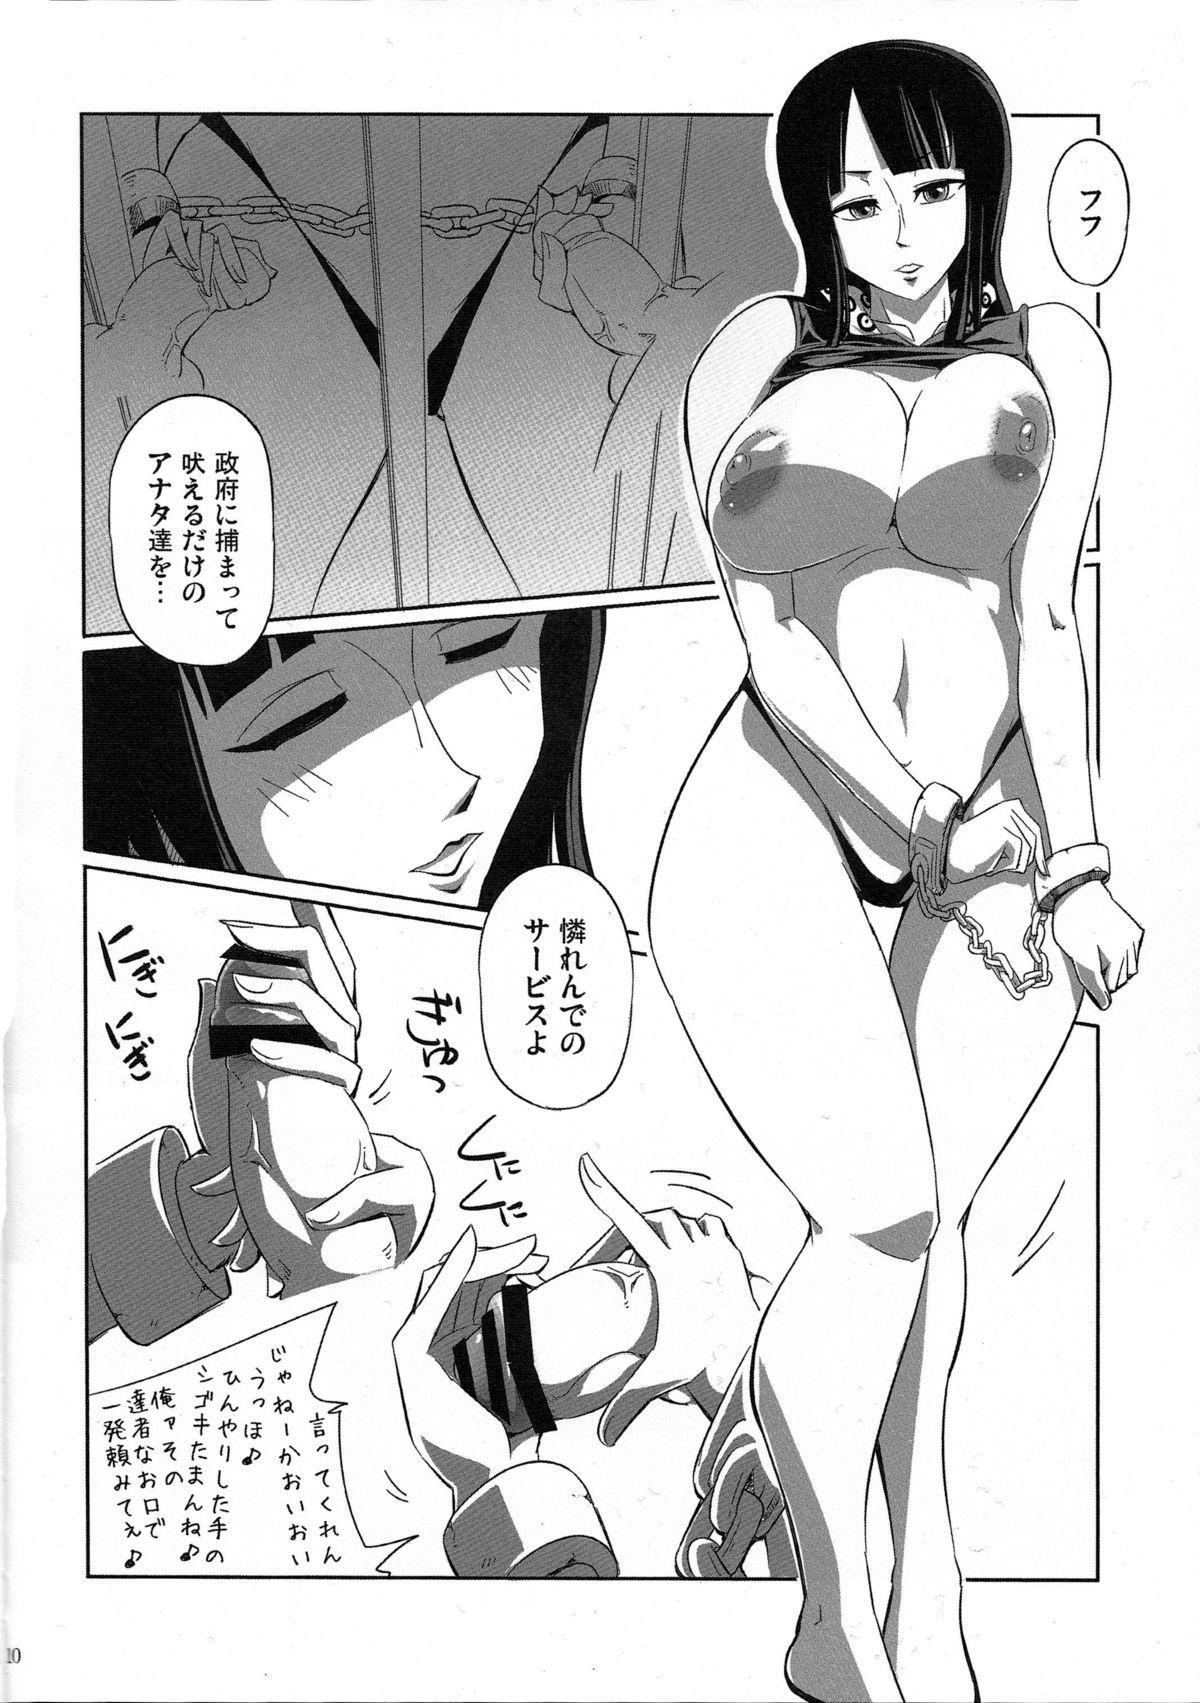 Pleasure 8